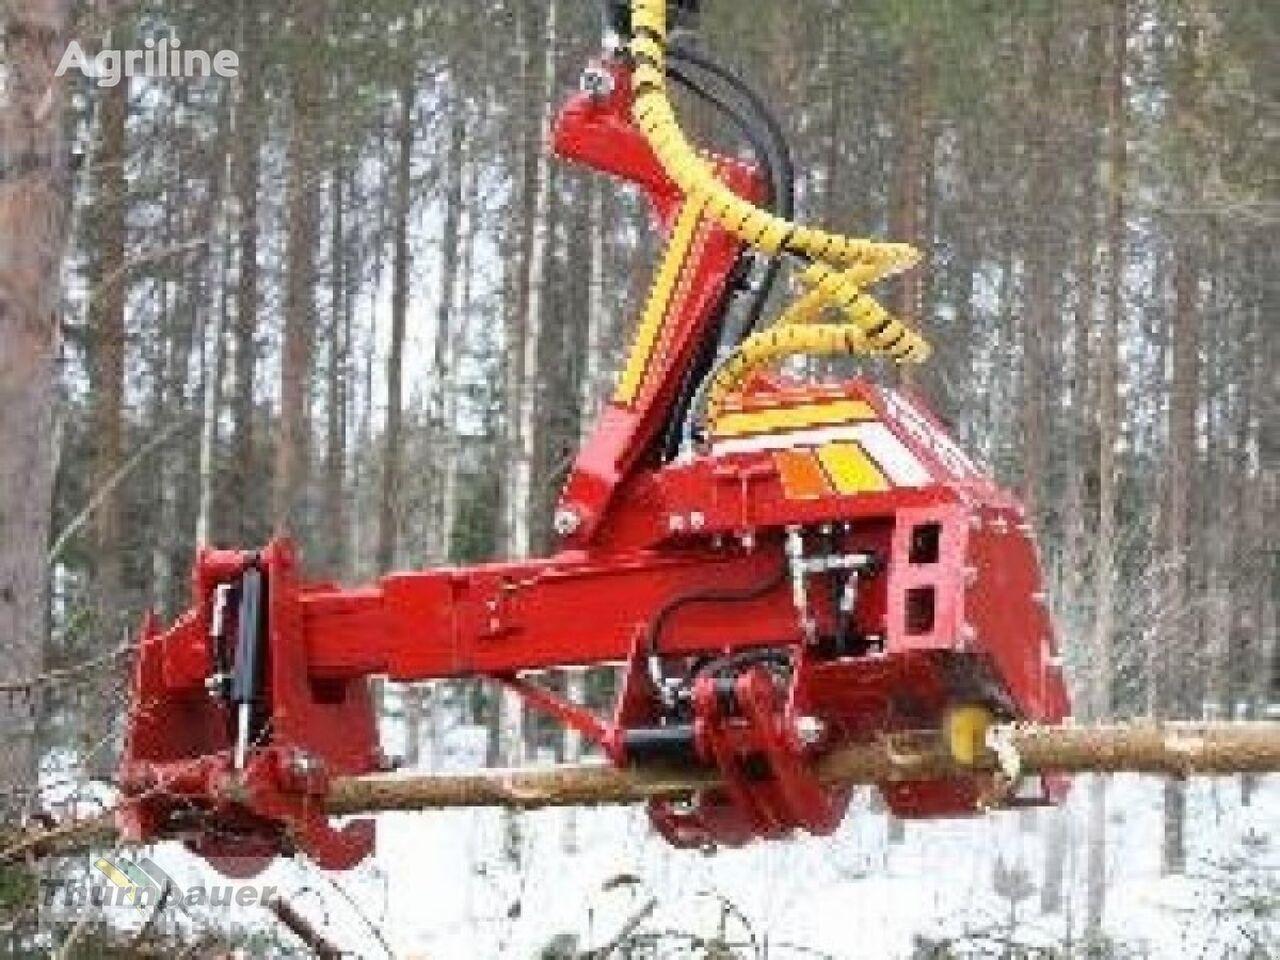 new 160 Schubharvesterkopf wood chipper